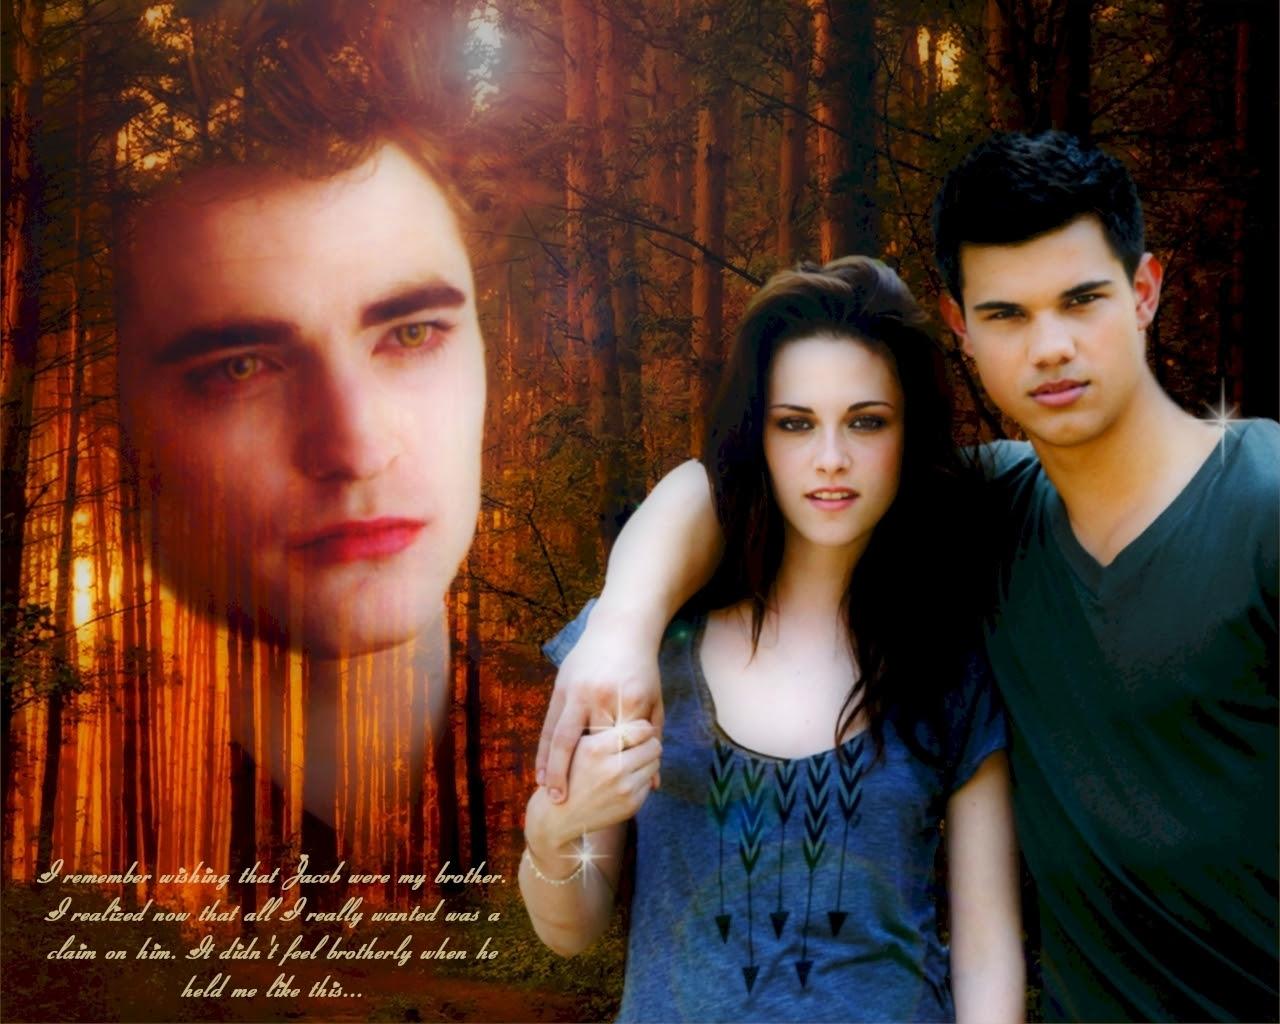 Edward Bella Jacob Series Twilight Wallpaper 8380315 Fanpop